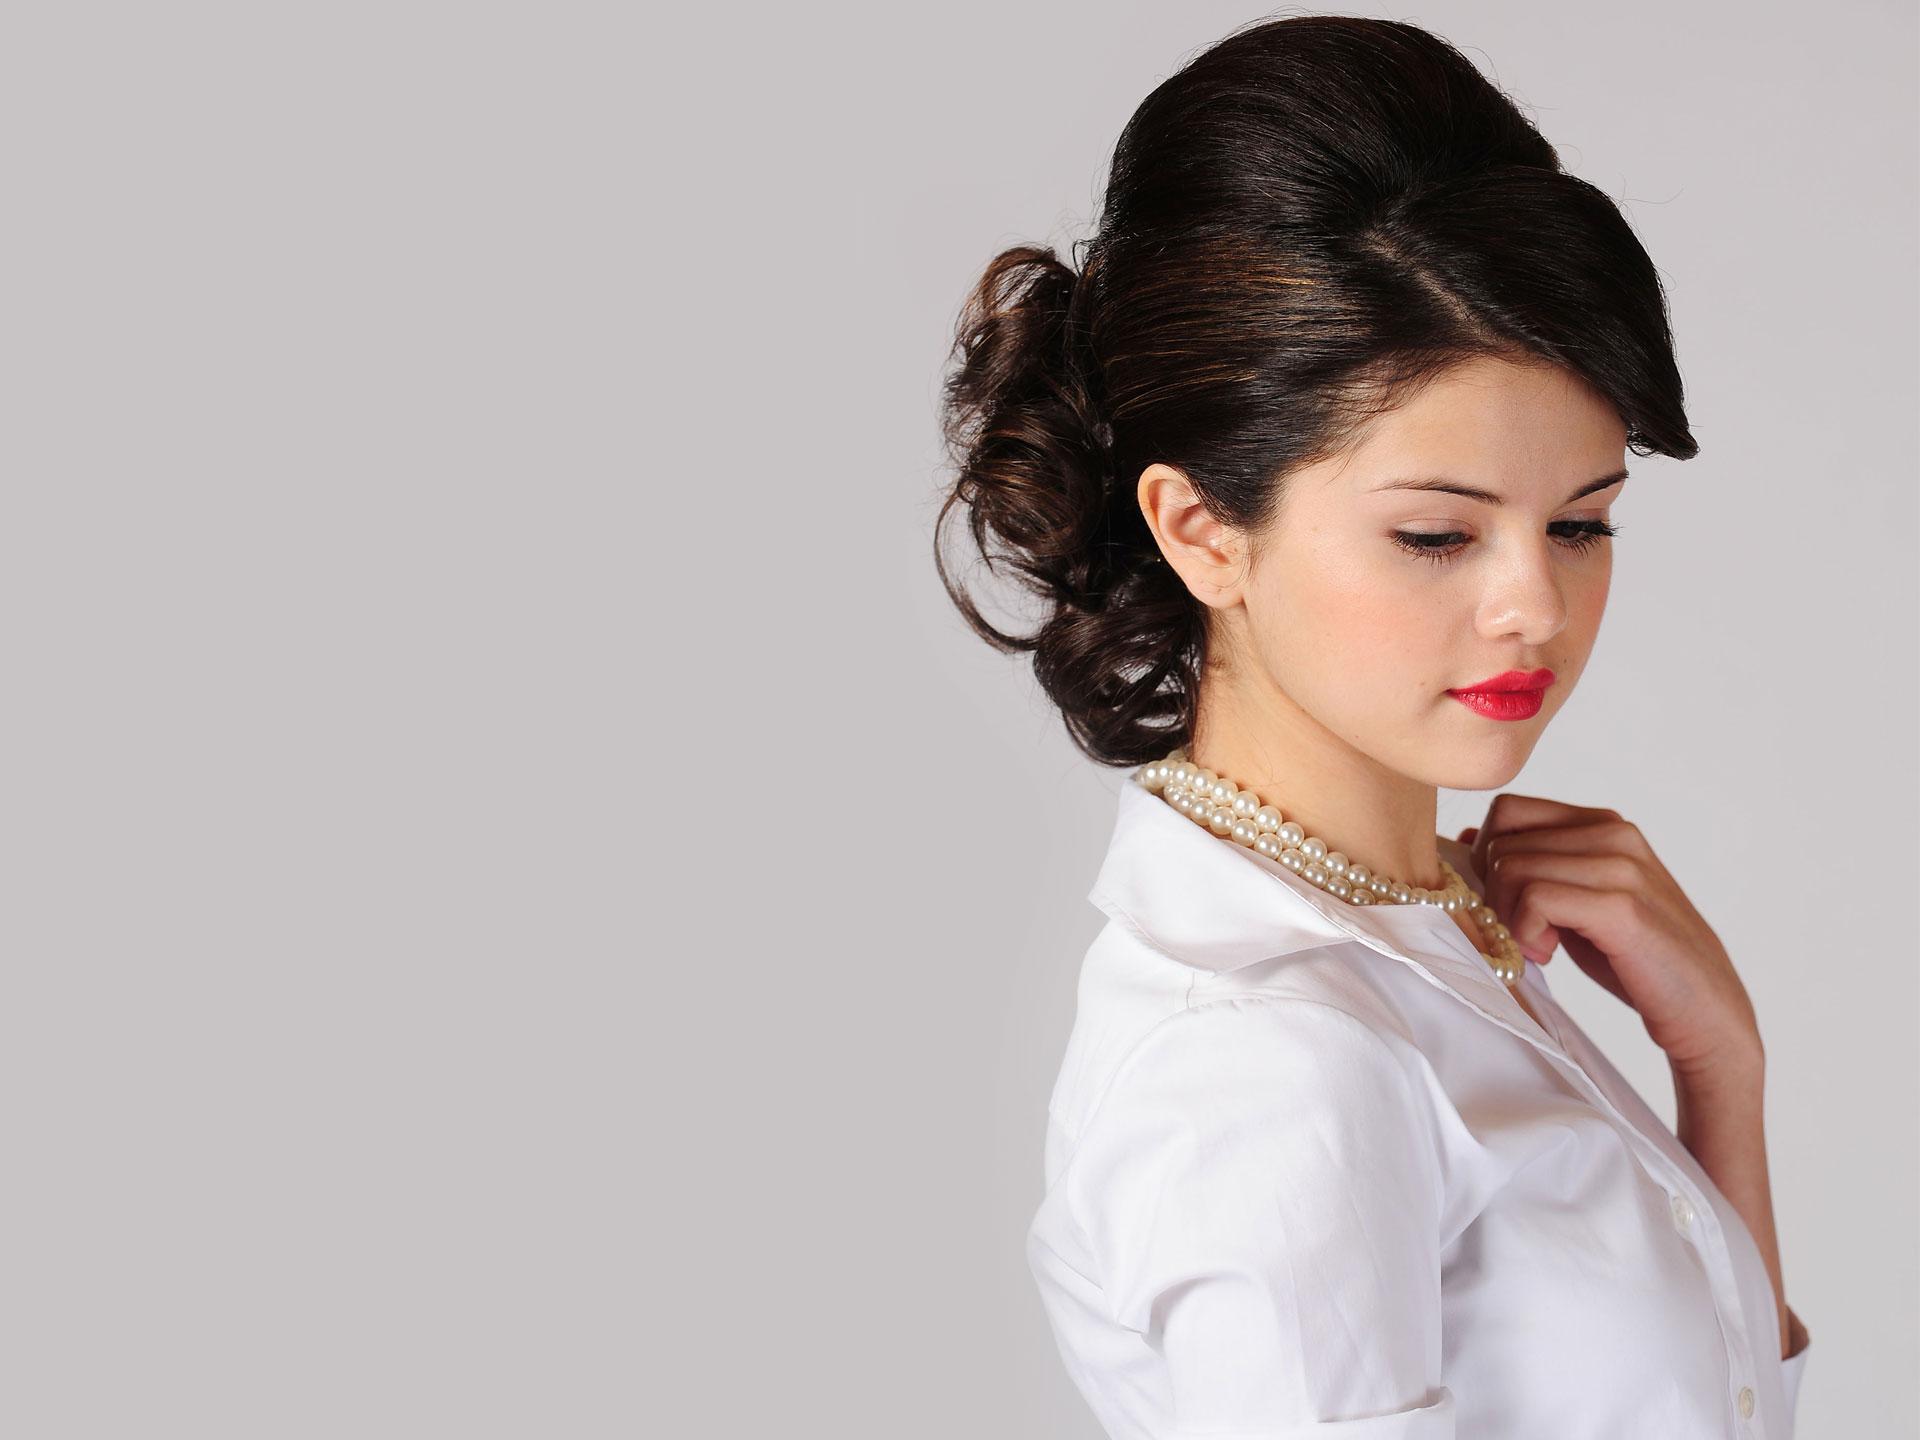 HD Wallpapers Selena Gomez 6